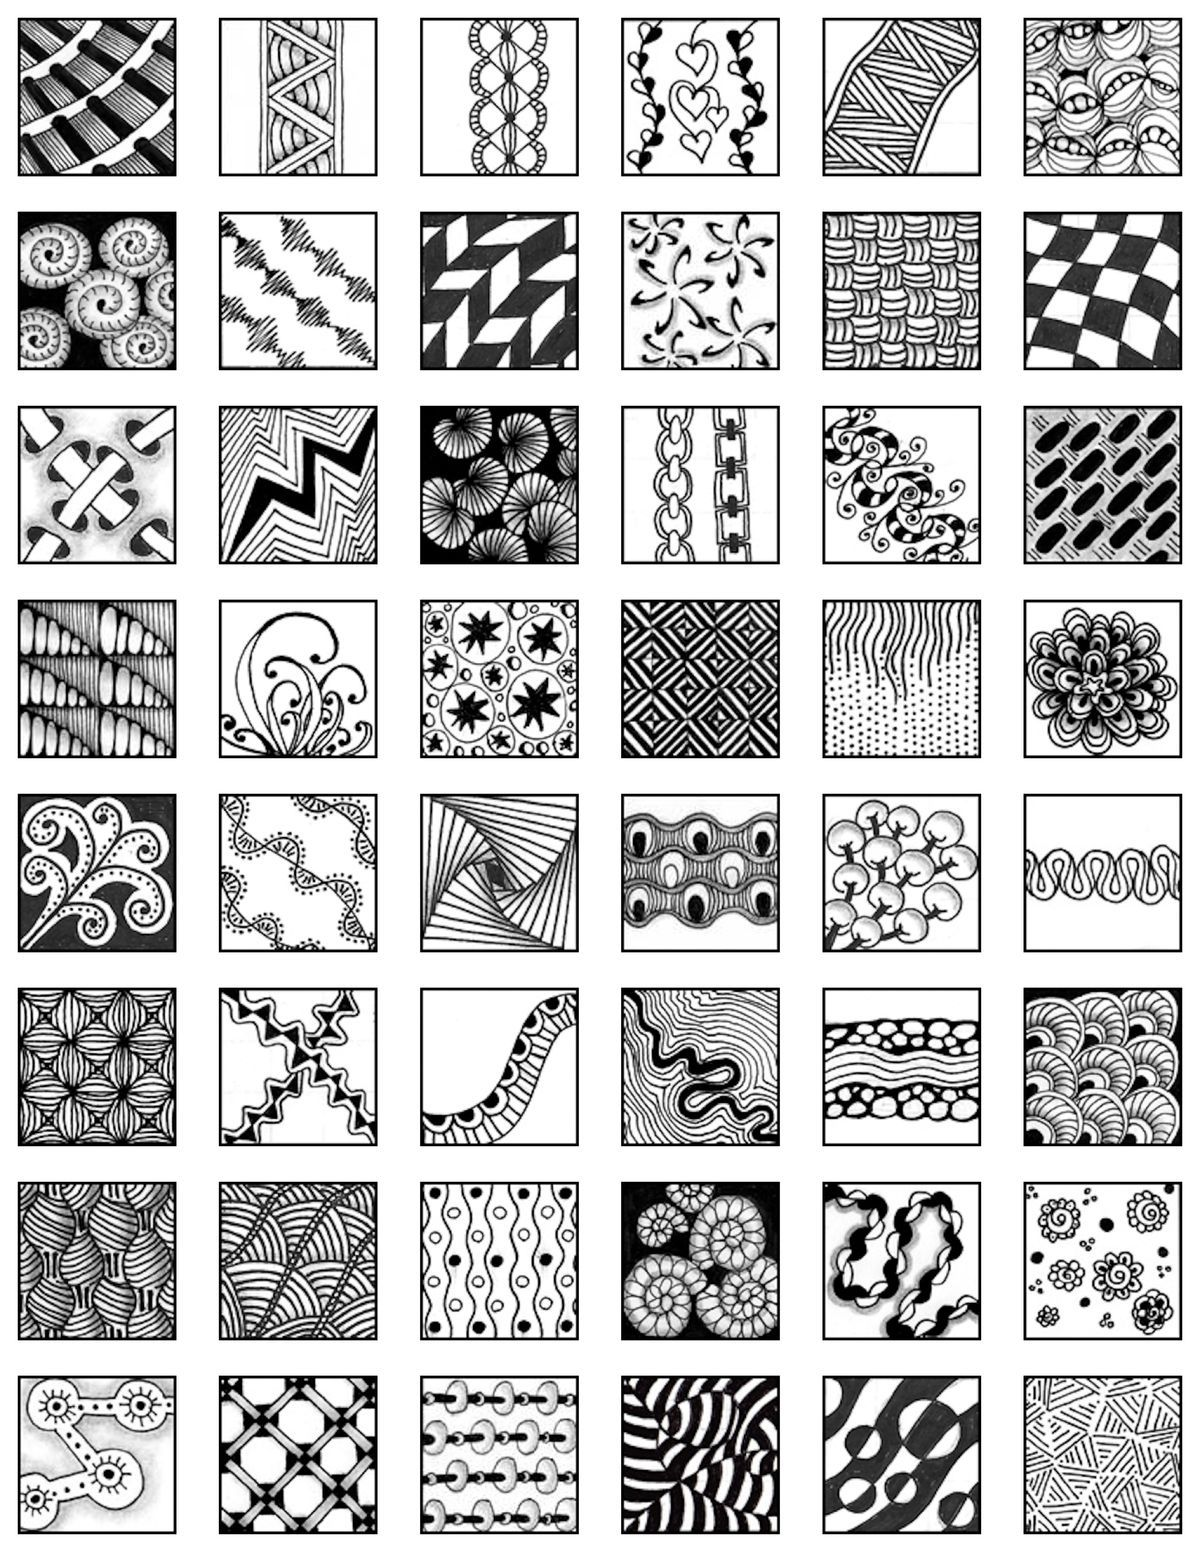 Fa50d000f802080fcd6ad2e638cecb40 Jpg 1 200 1 552 Pixeles Zentangle Kunst Zentangle Designs Zentangle